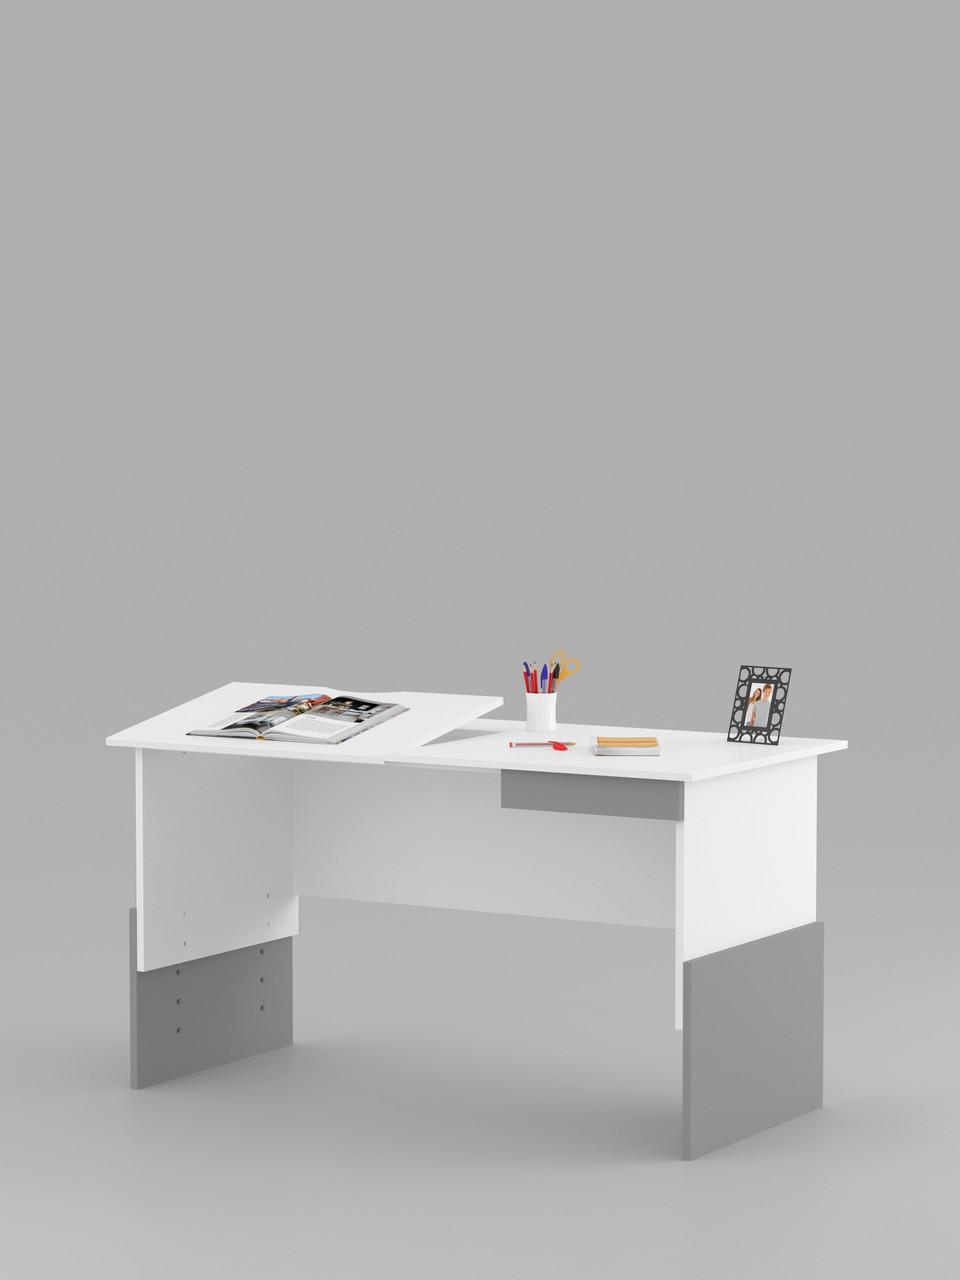 Письменный стол 14 MAX PLUS P/L LOL, Meblik (Польша)